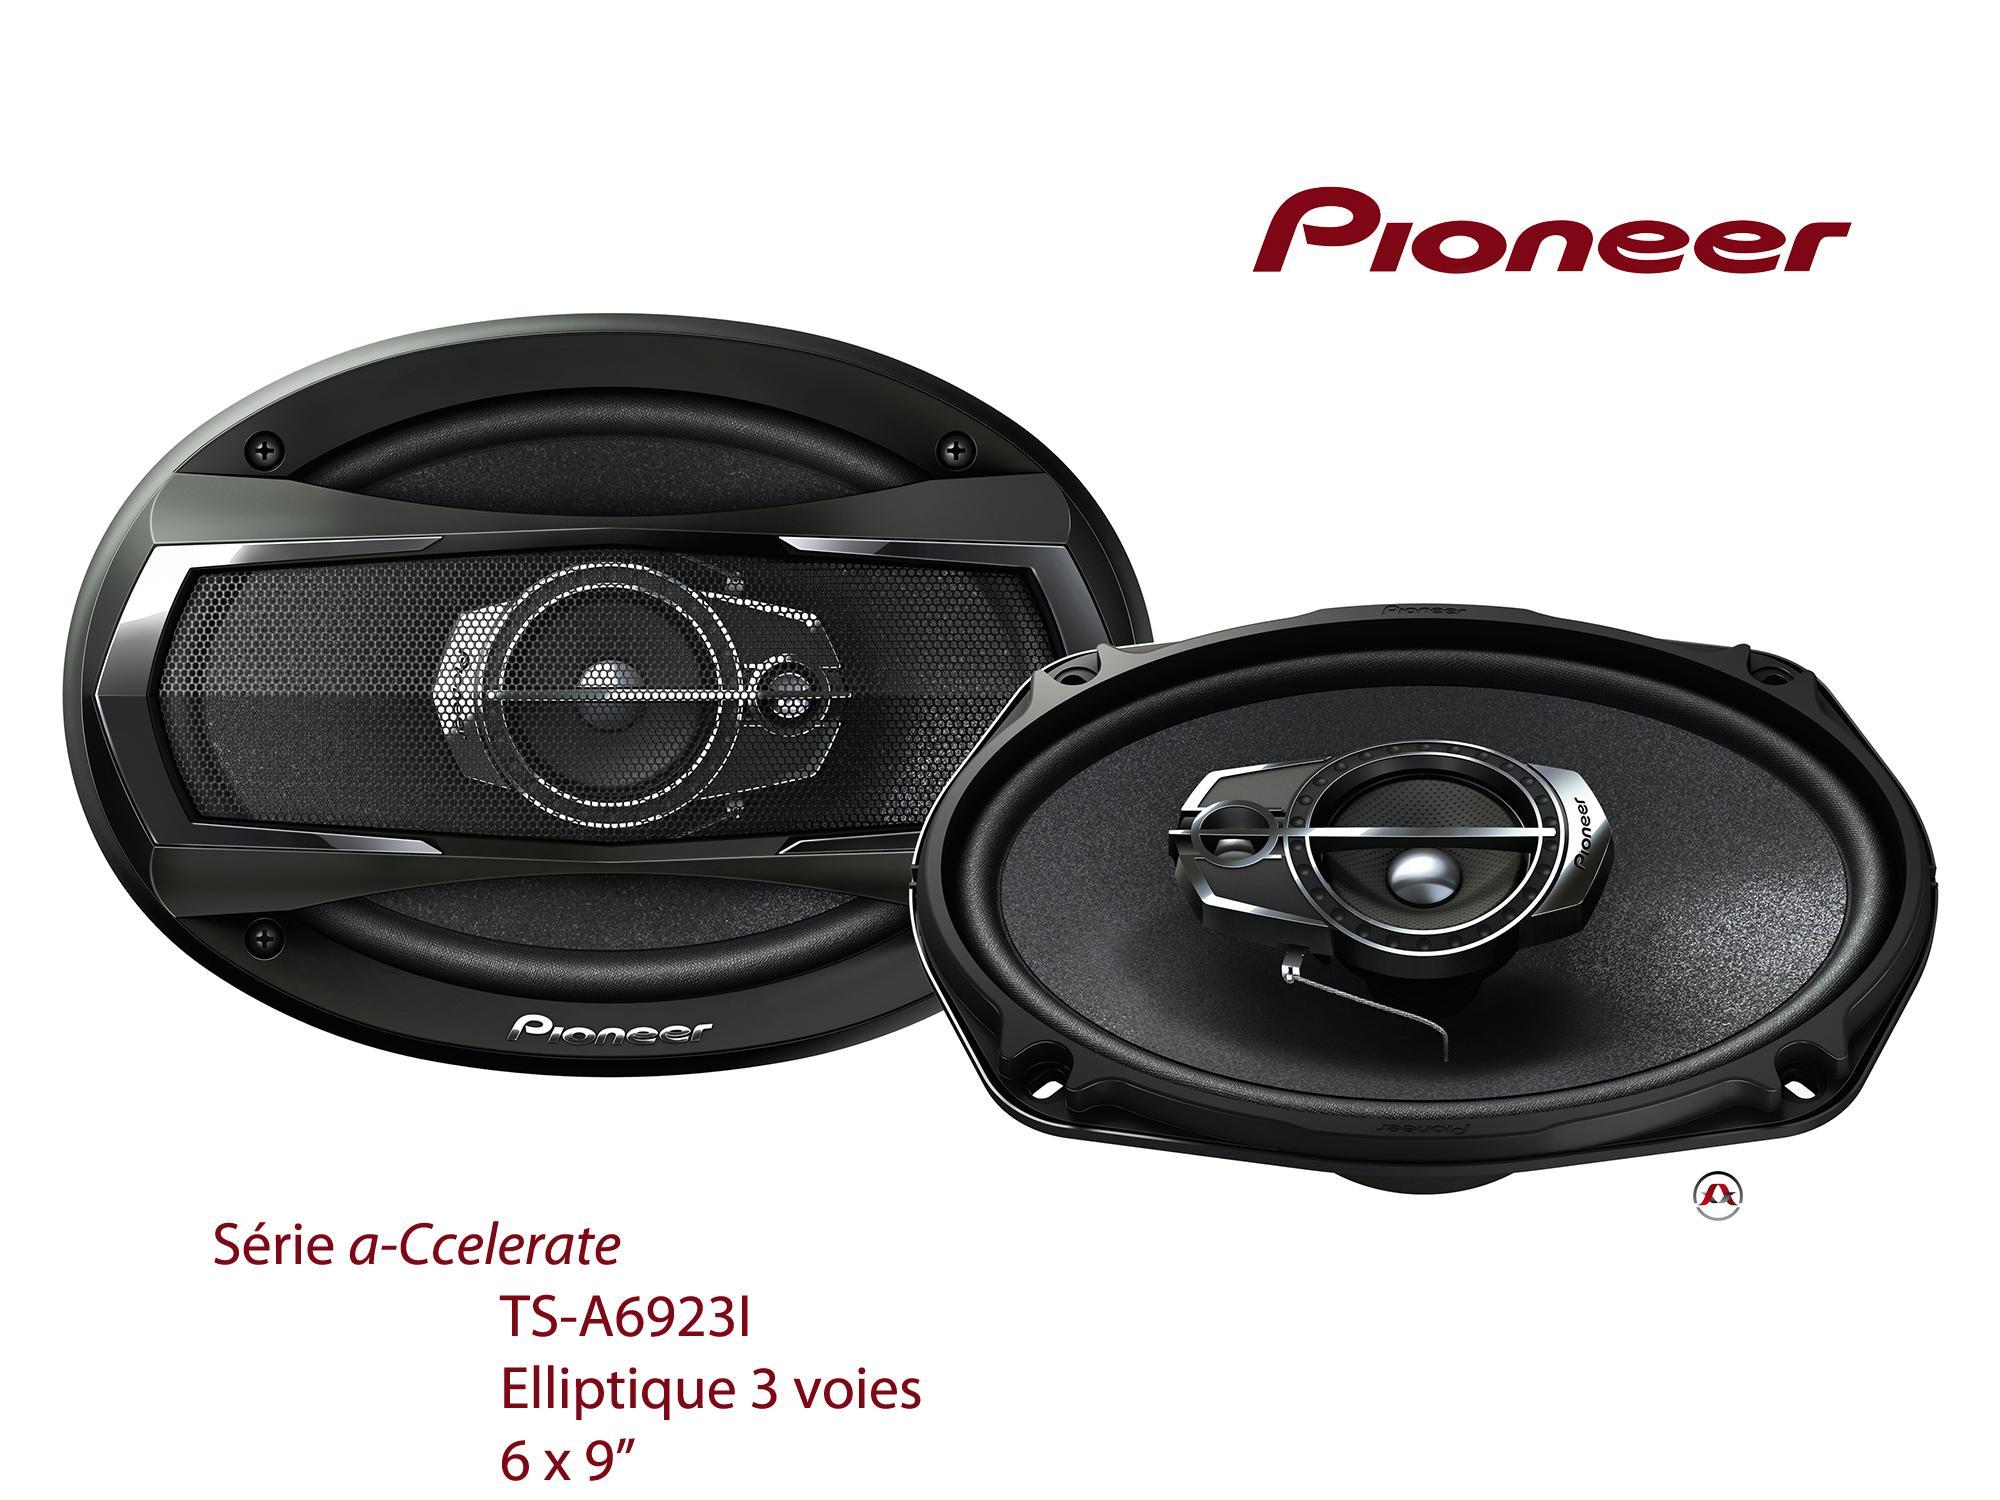 haut parleurs pioneer pioneer ts a6923i 60w rms. Black Bedroom Furniture Sets. Home Design Ideas